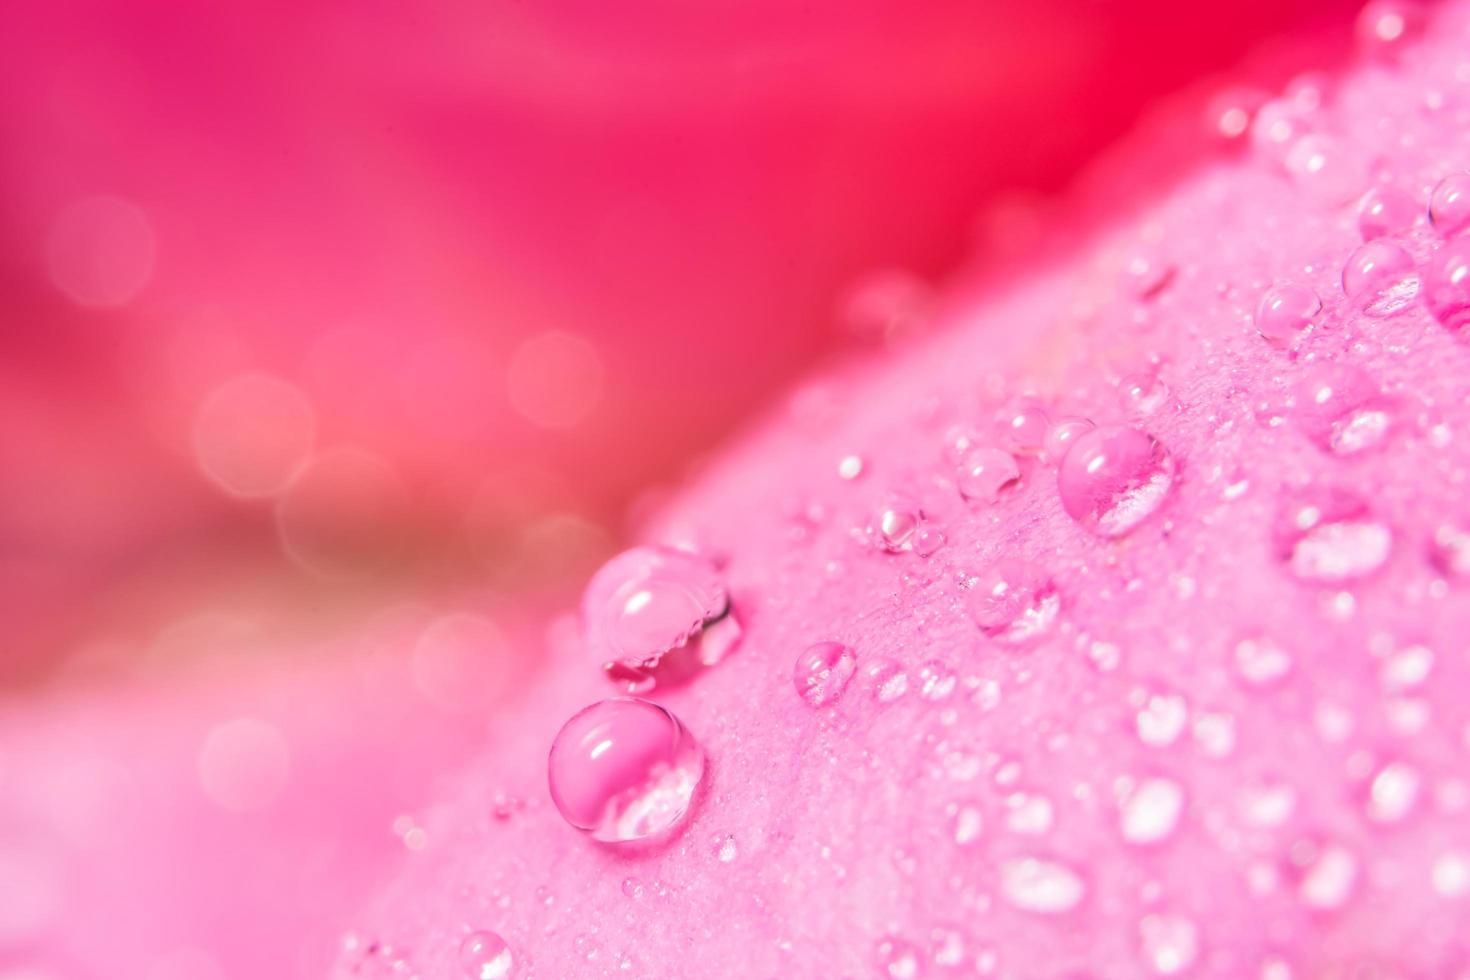 gocce d'acqua sui petali di rosa foto